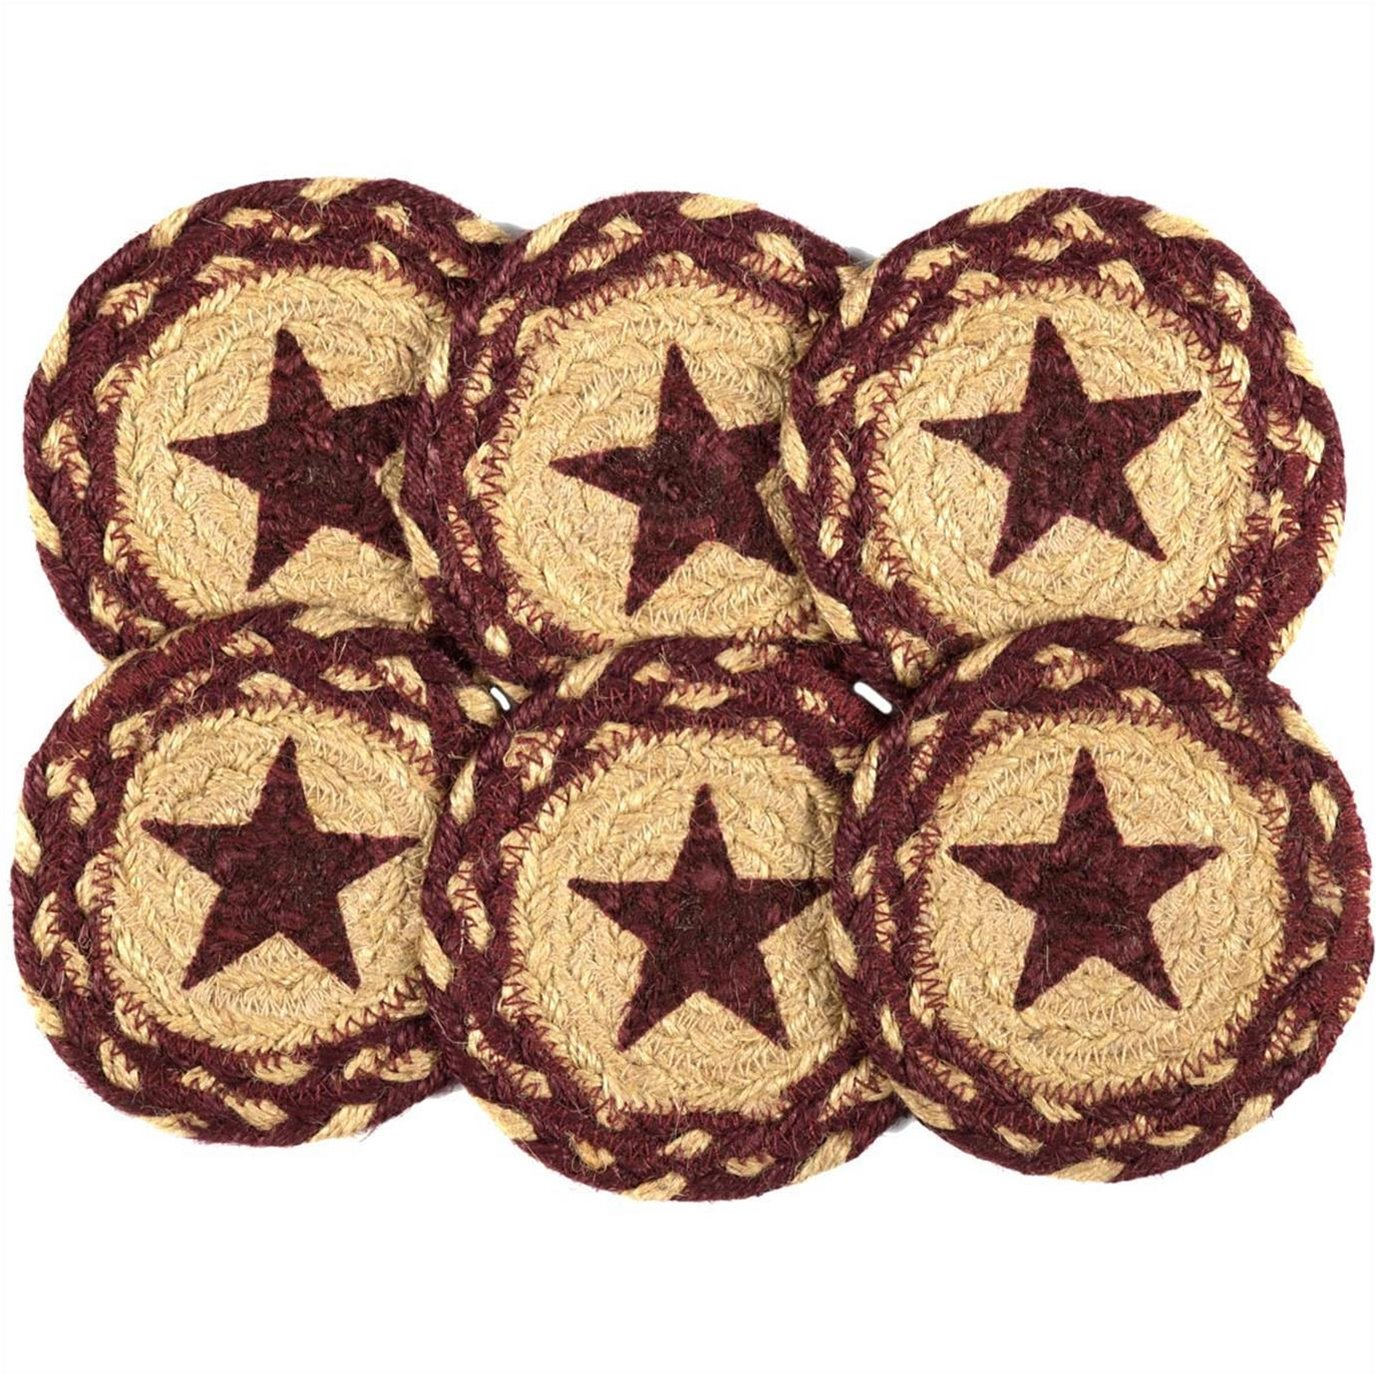 Burgundy Tan Jute Coaster Stencil Star Set of 6